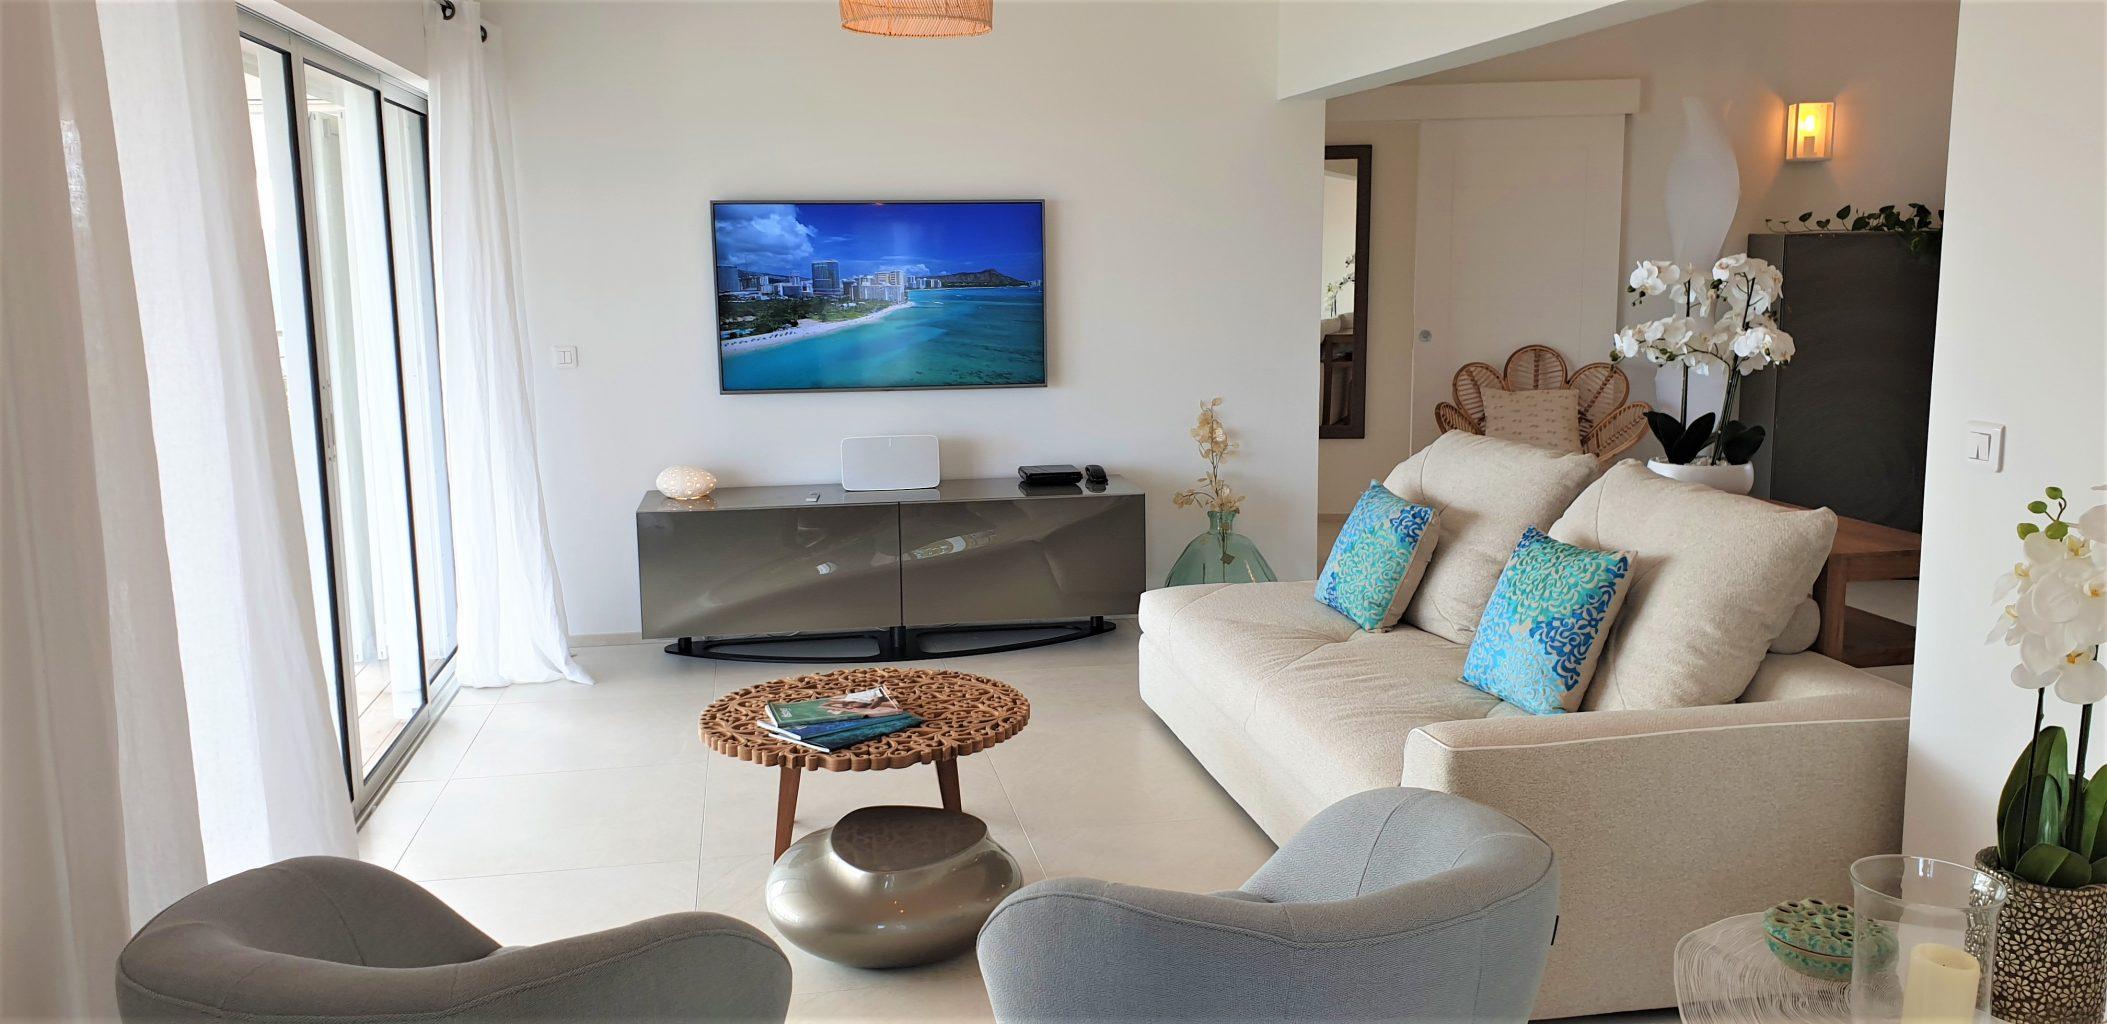 Villa Marris - Modern Villa Rent St Barth Lurin Sea view - Living room